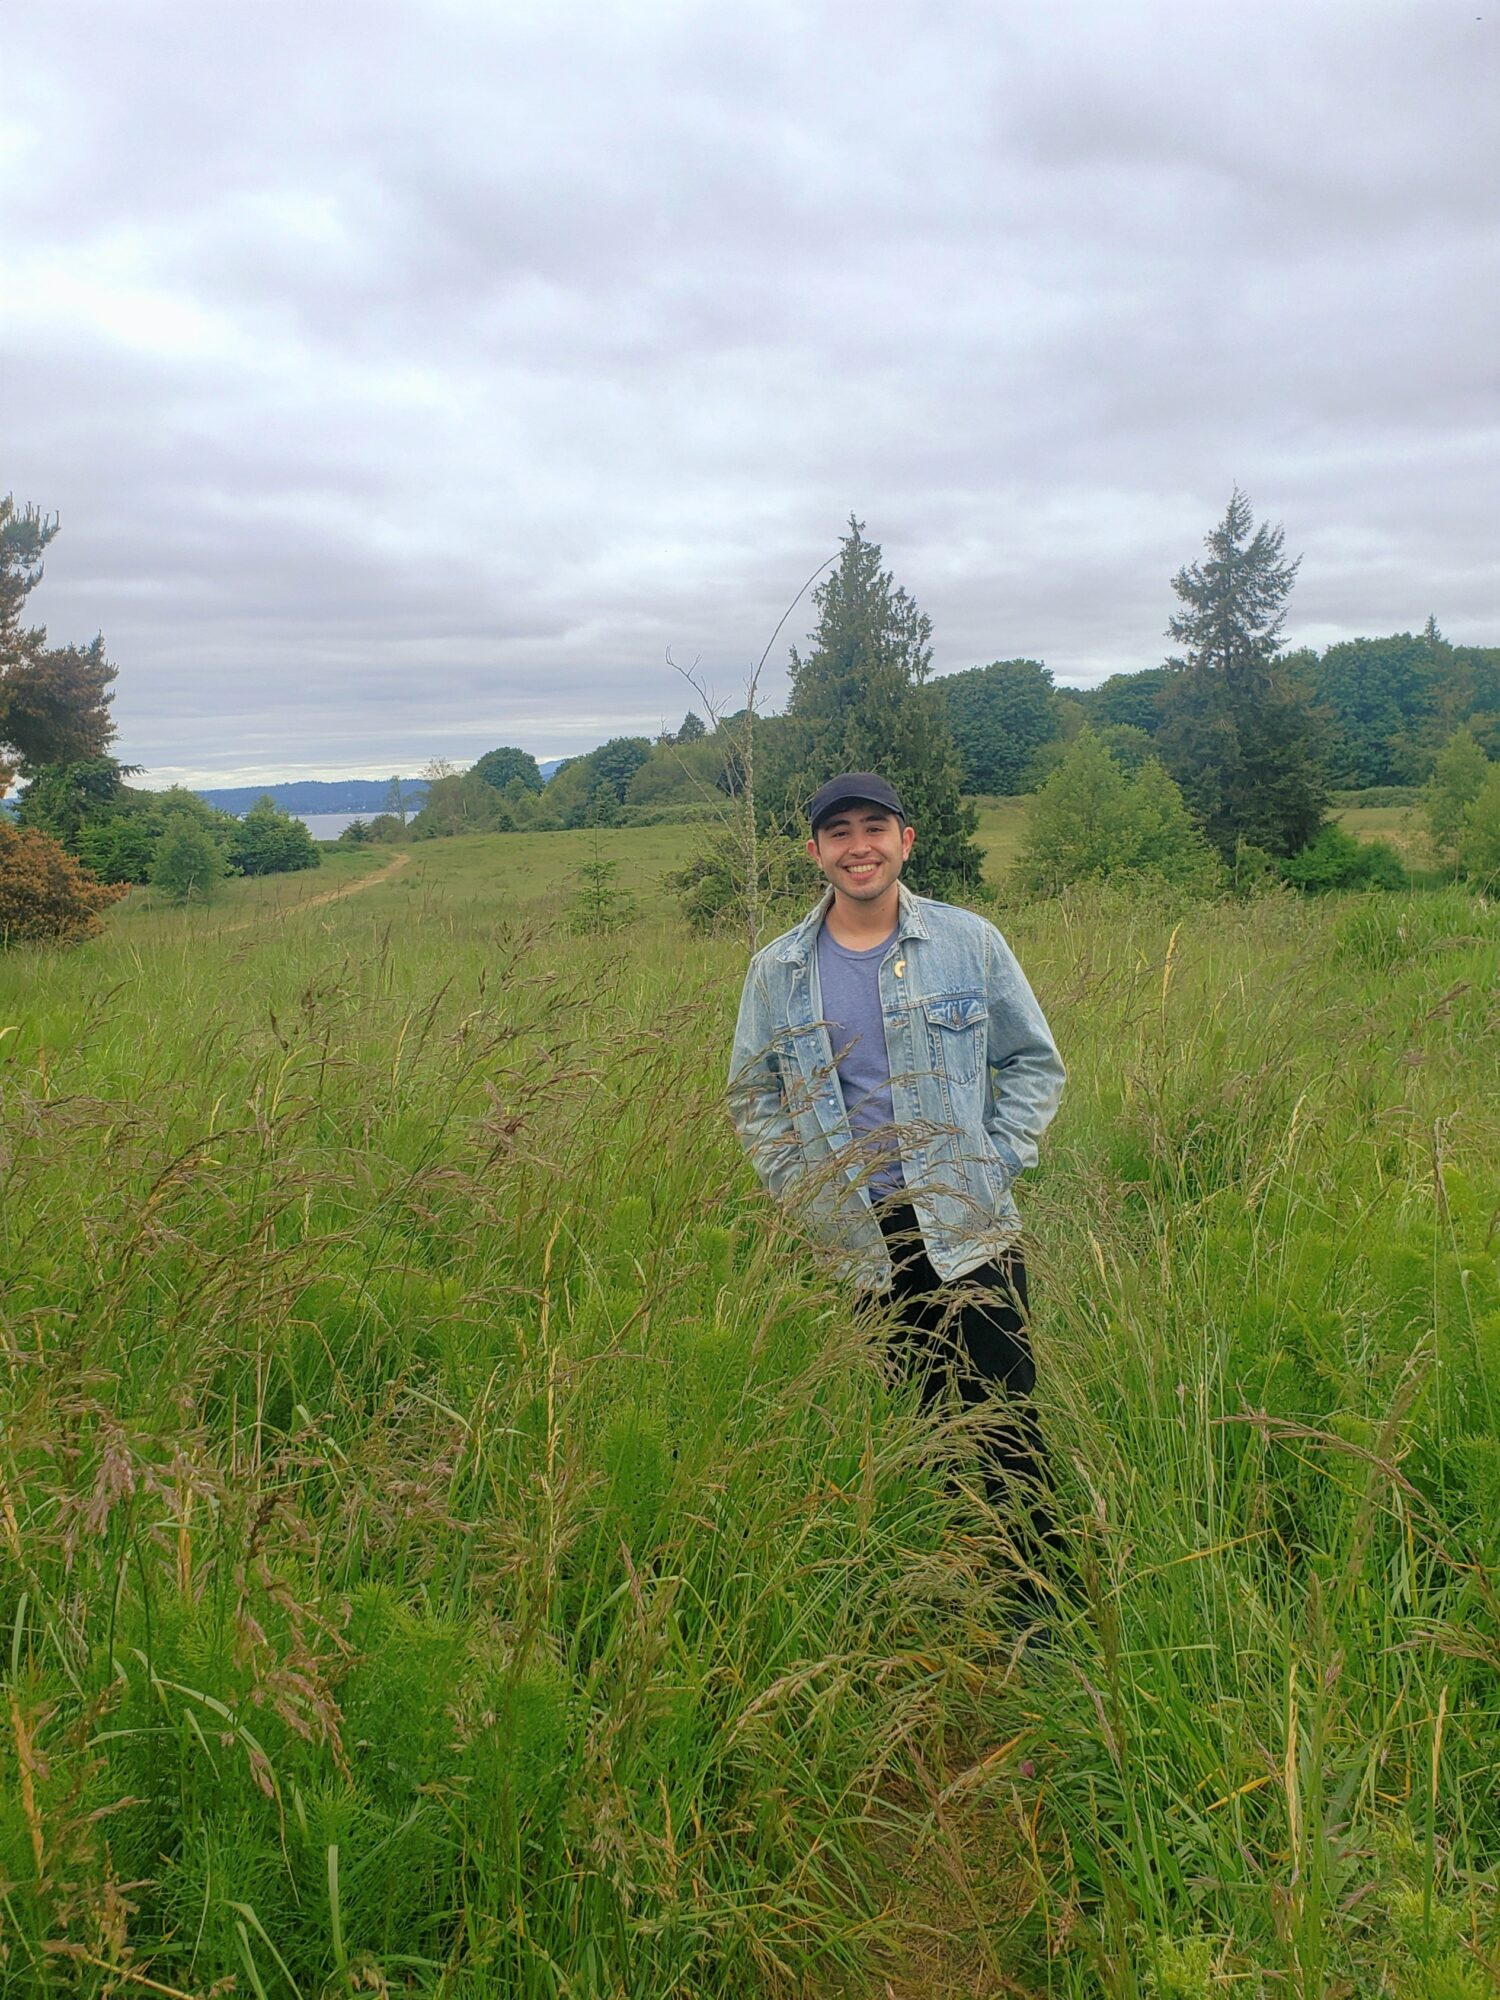 Man standing n a field